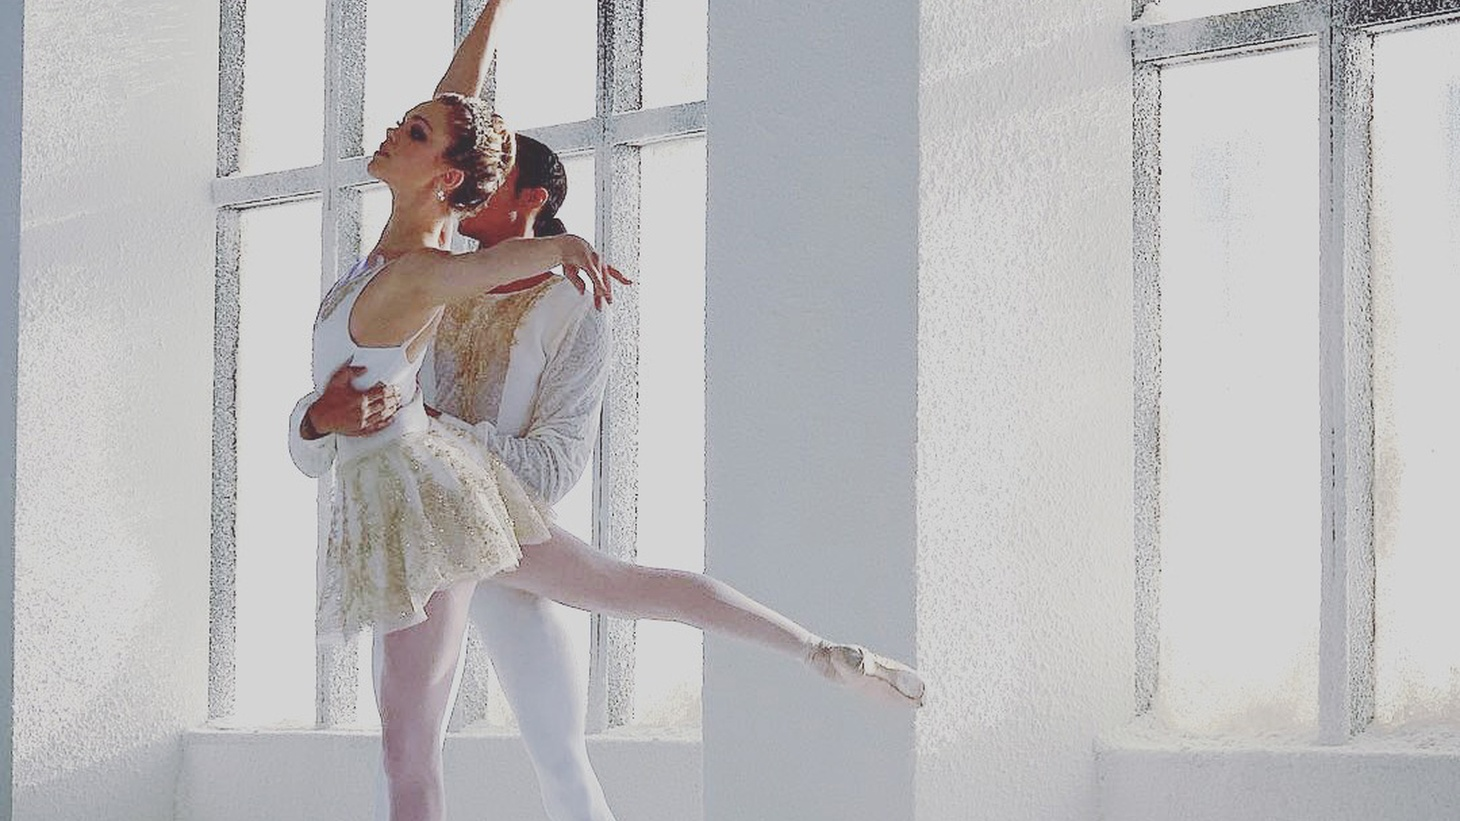 Photo courtesy of American Contemporary Ballet